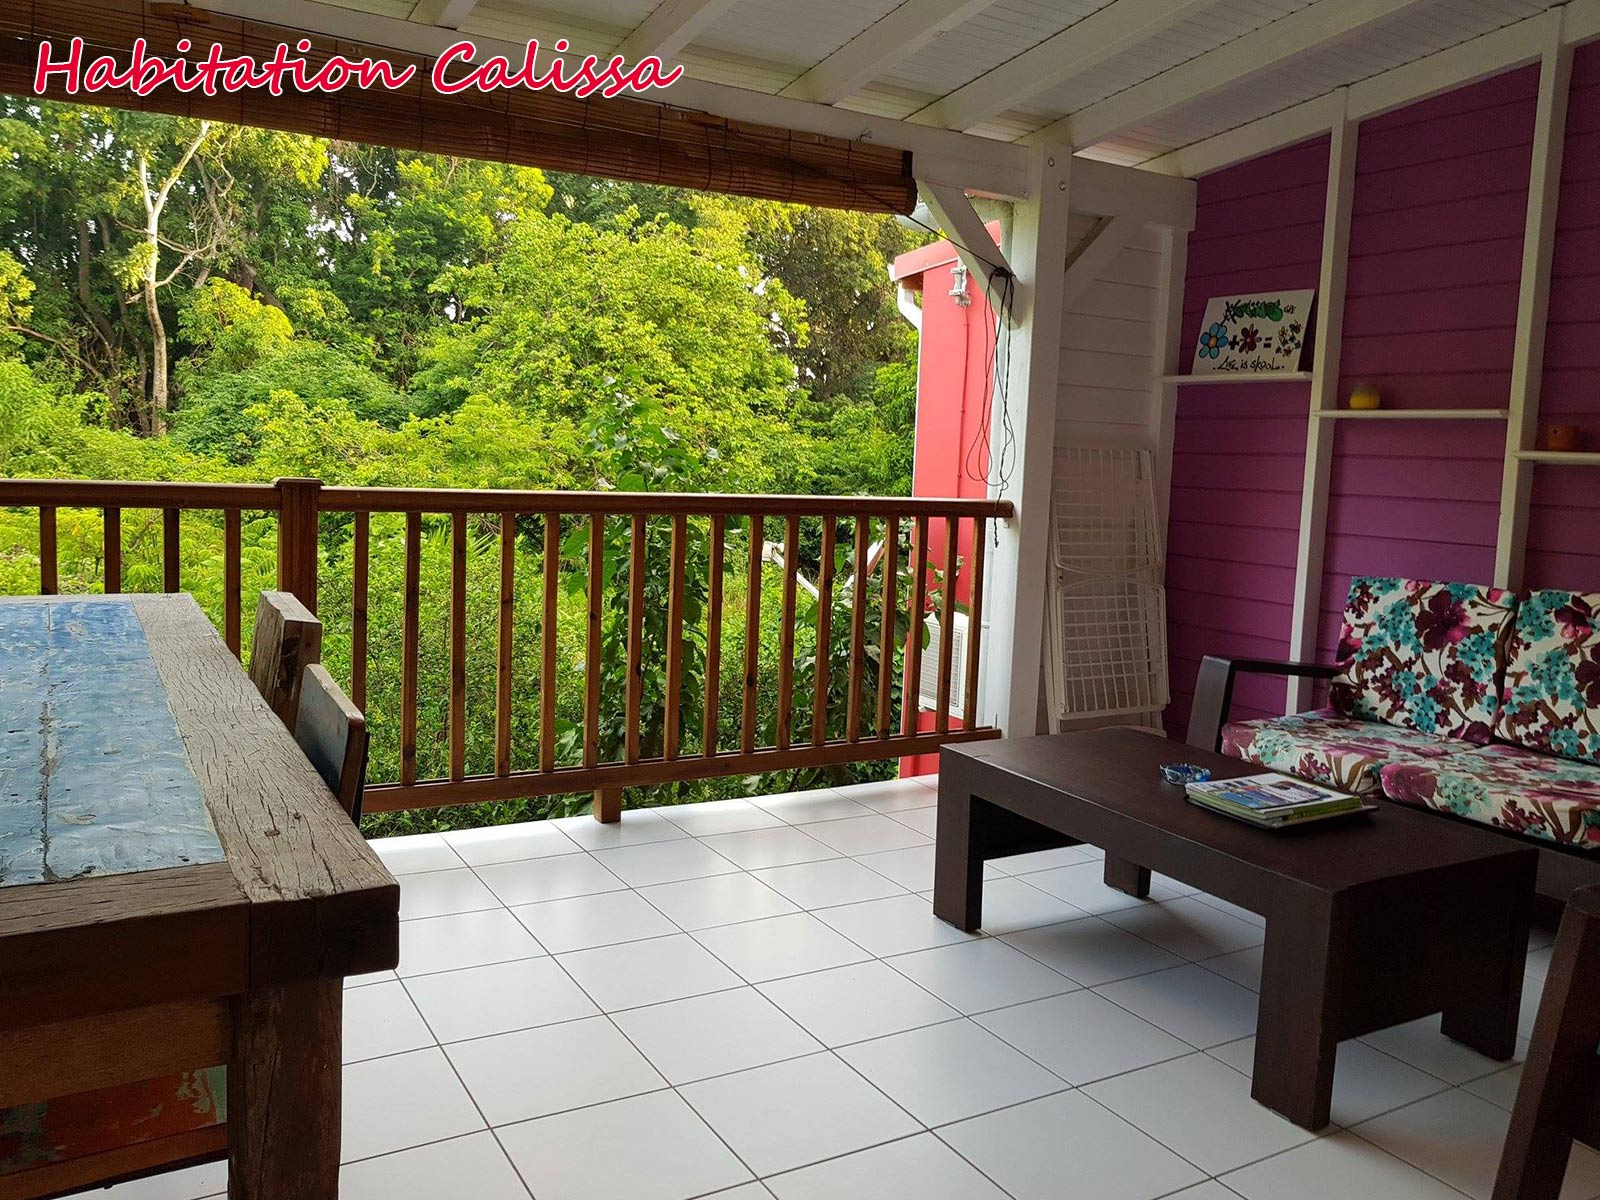 Habitation Calissa - Salon sur jardin